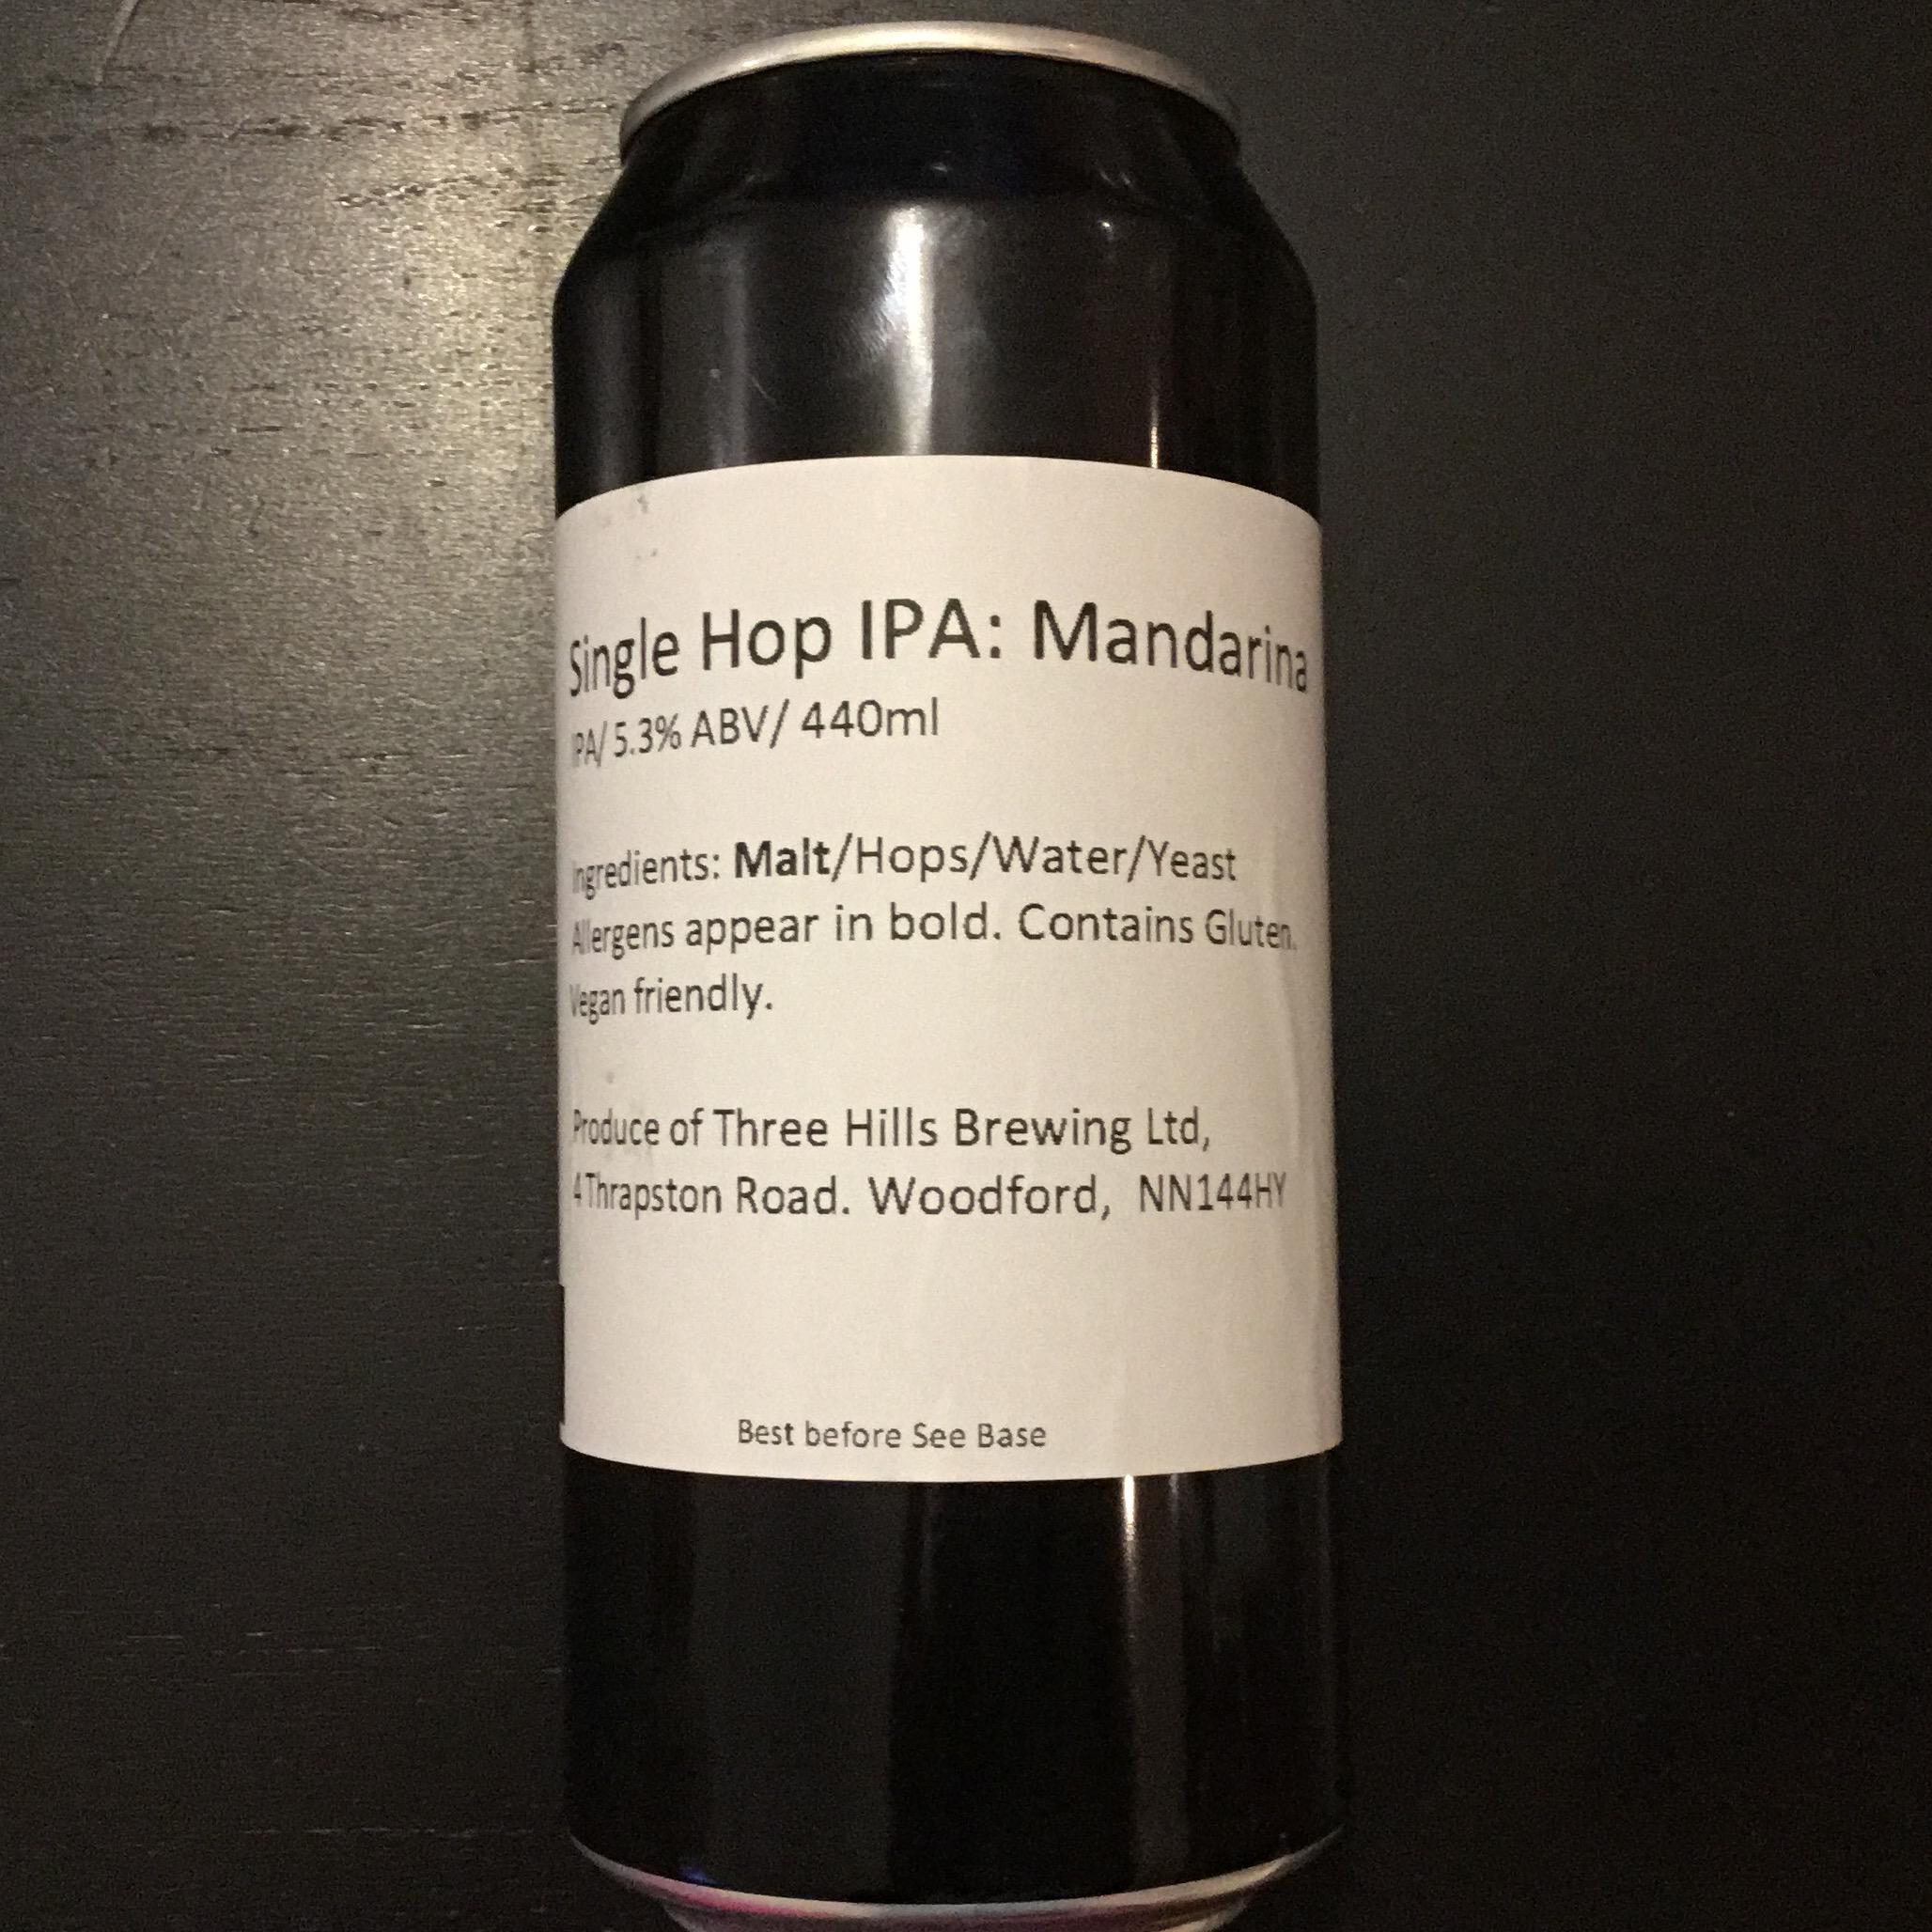 Mandarina Single Hop IPA 5.3% 440ml Three Hills Brewing